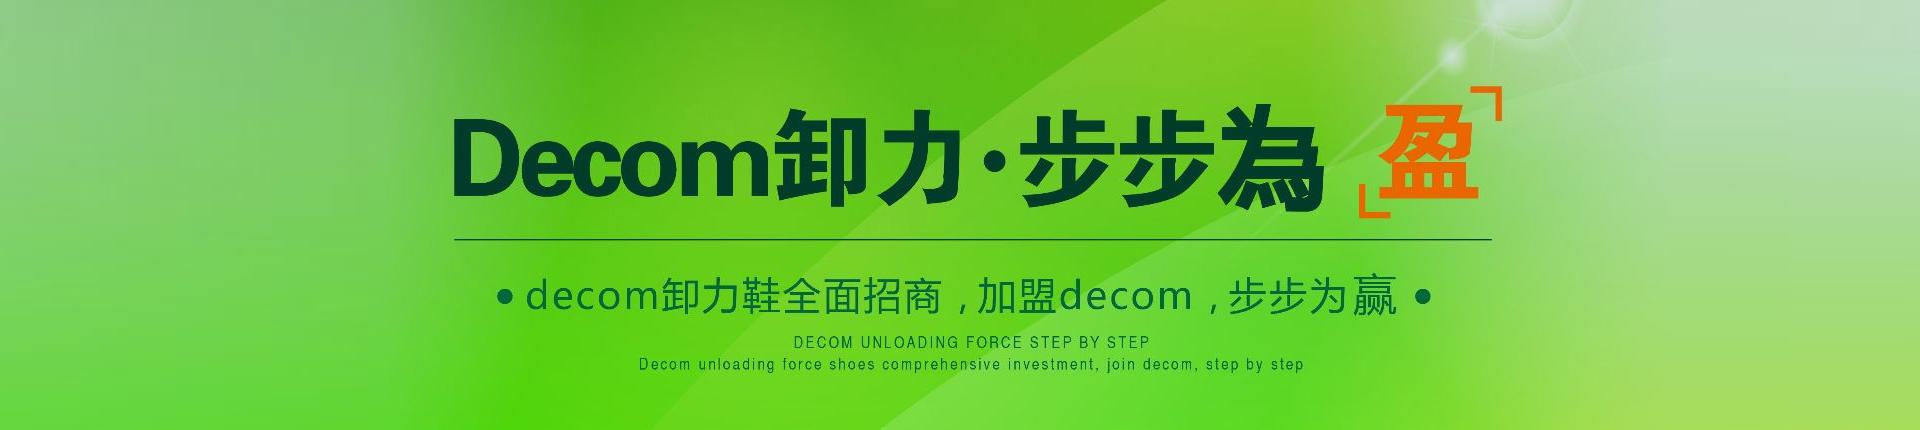 Decom官方网站